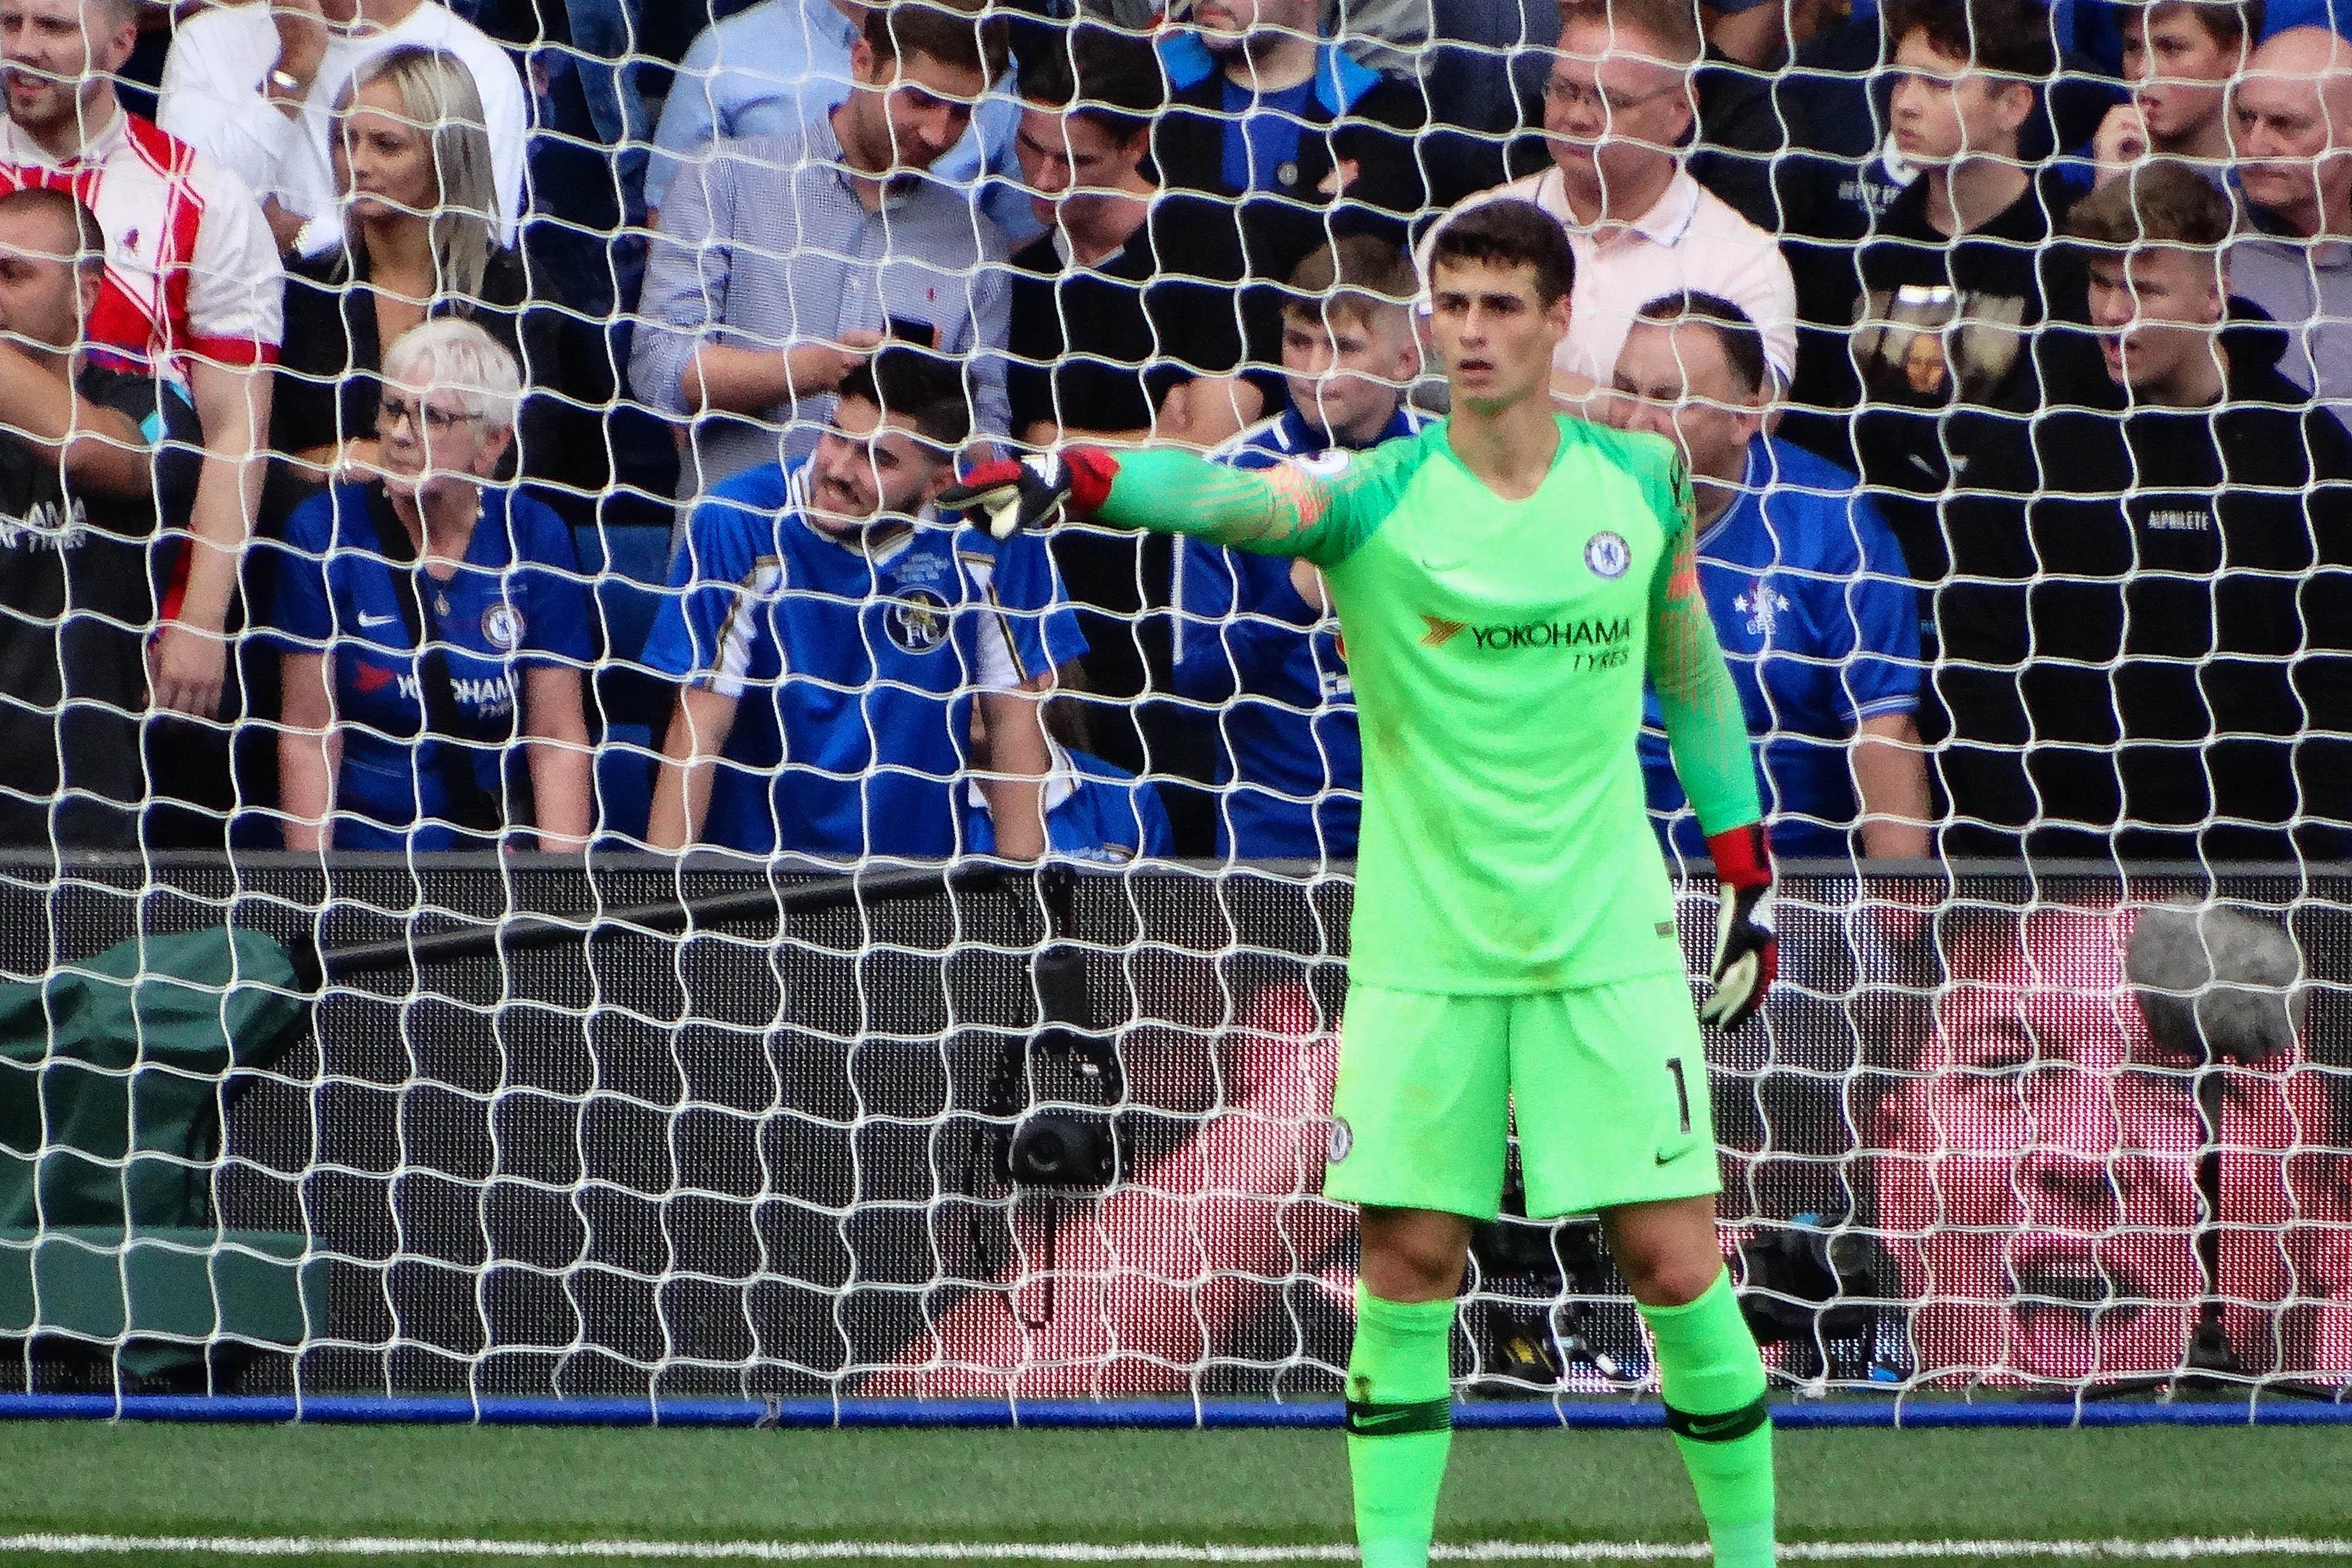 Chelsea's #1 Kepa Arrizabalaga organizes his defence